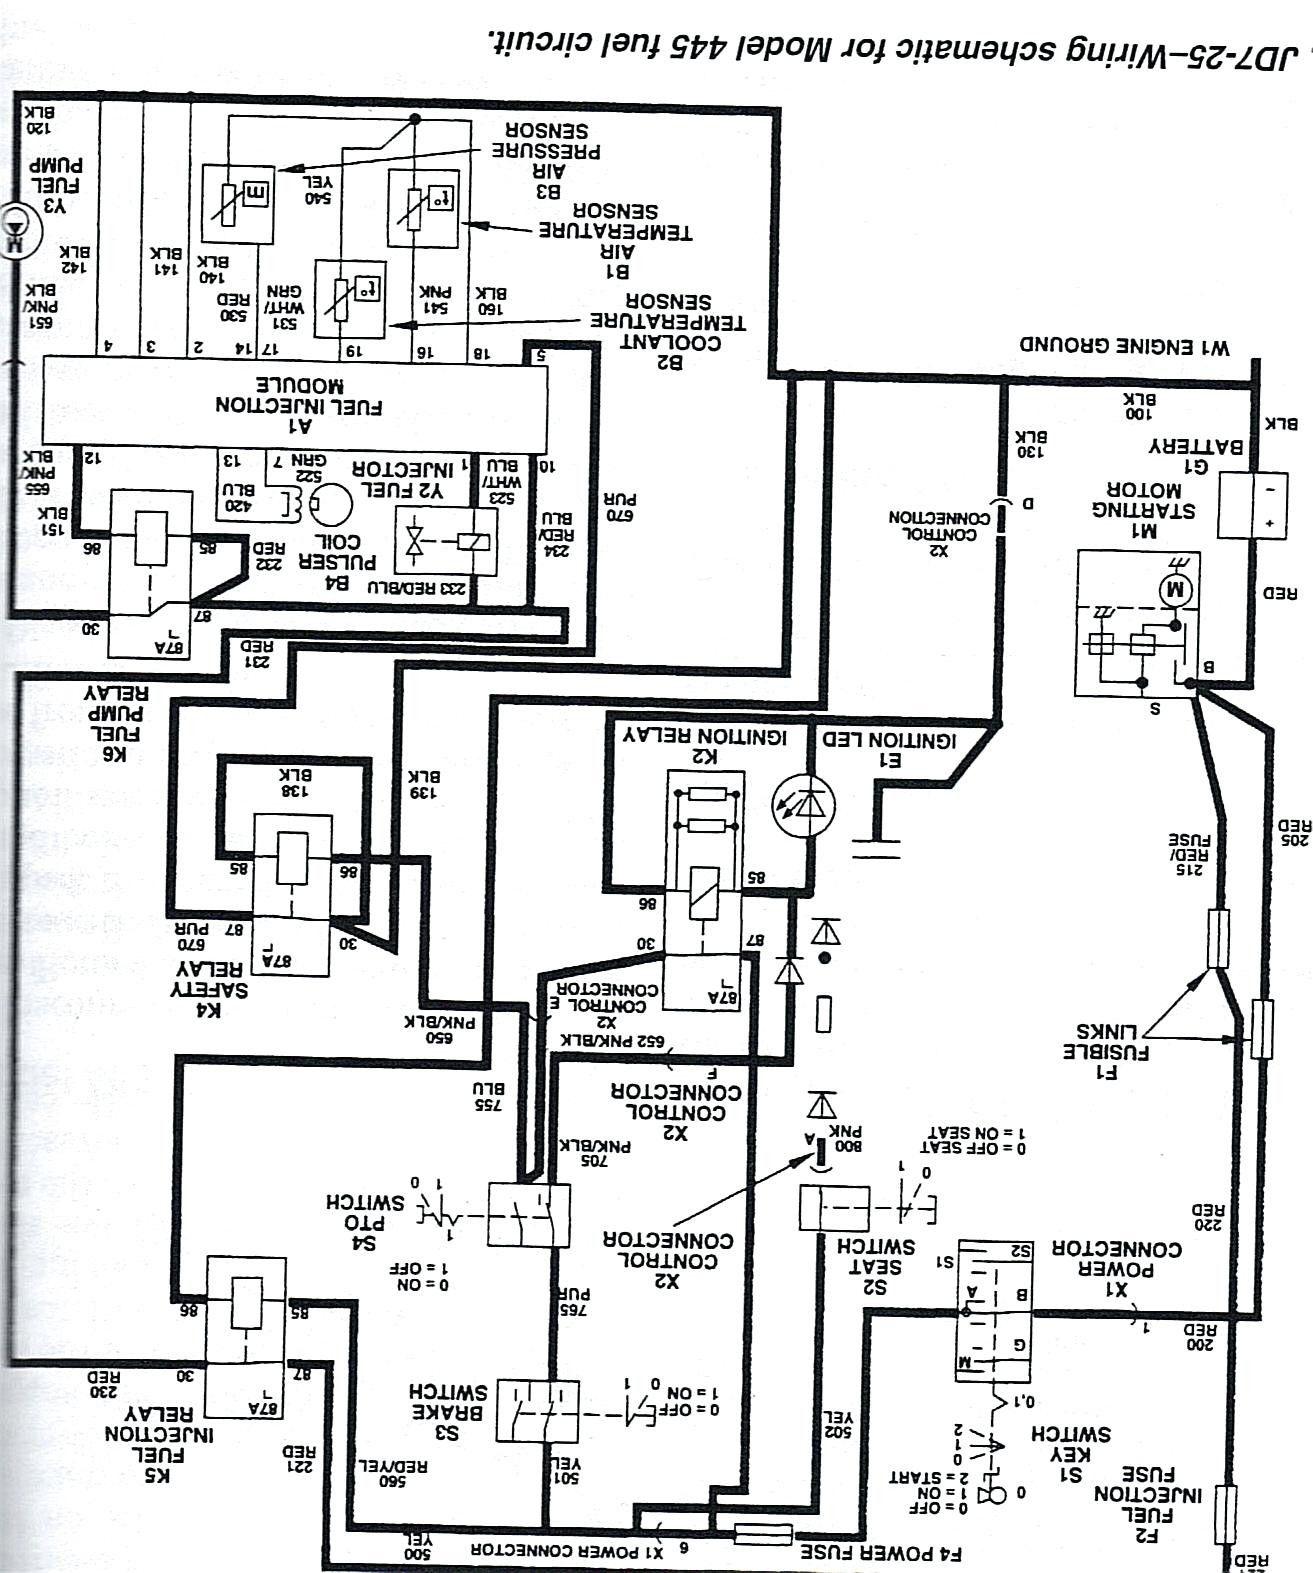 New Home Wiring Diagram Diagram Wiringdiagram Diagramming Diagramm Visuals Visualisation Graphical House Wiring Electrical Wiring Diagram Diagram